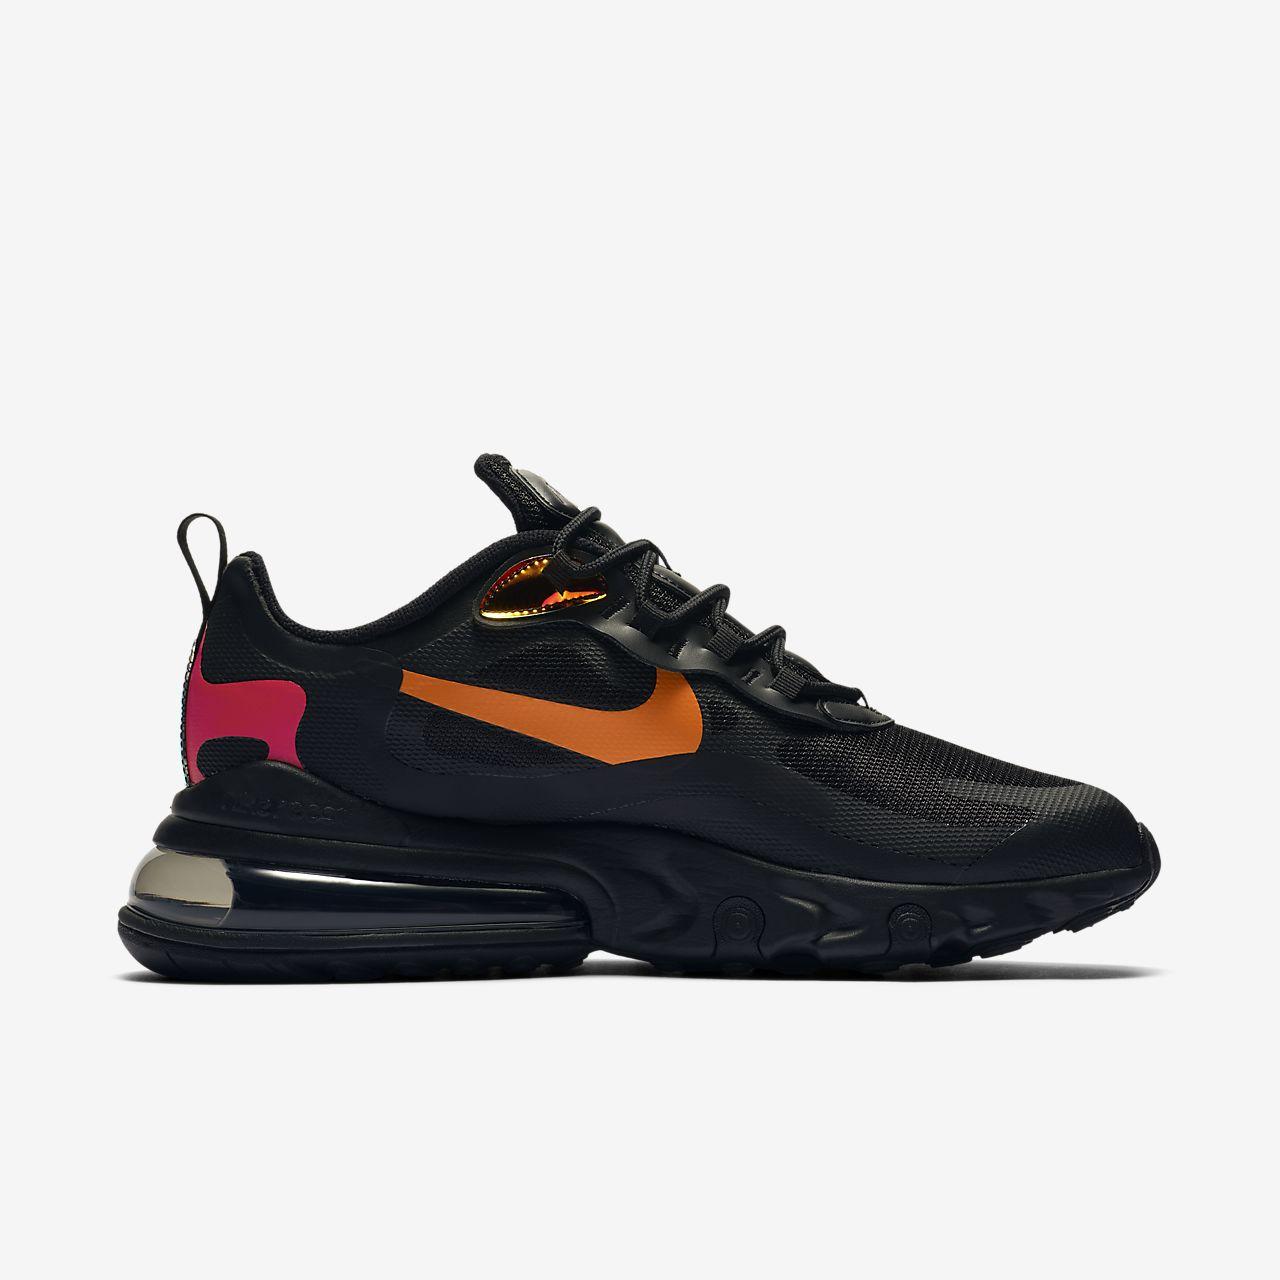 nike air max 270 react - homme chaussures